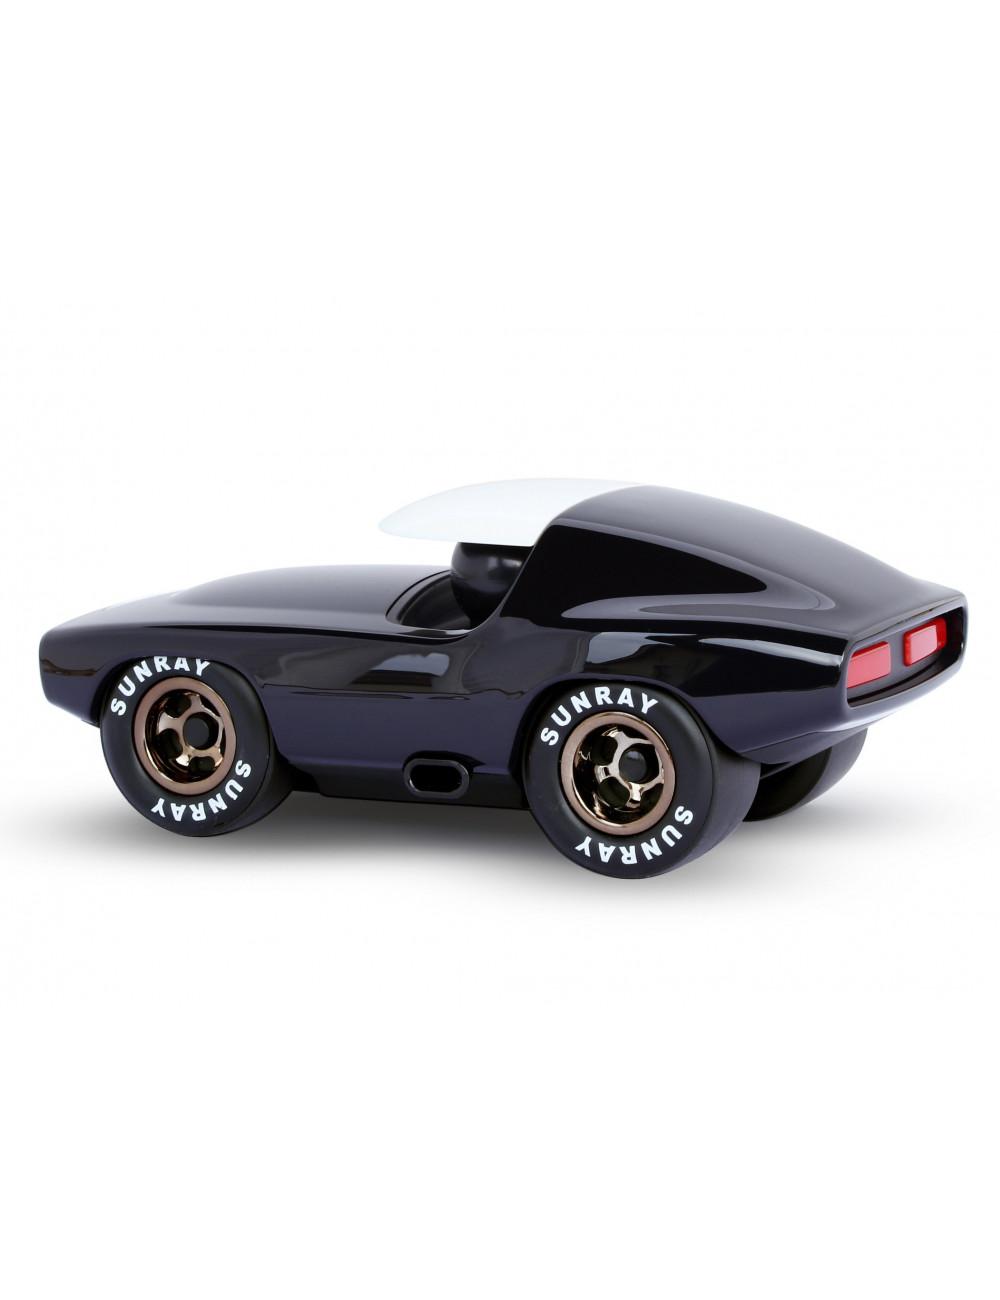 Speelauto Leadbelly Skeeter